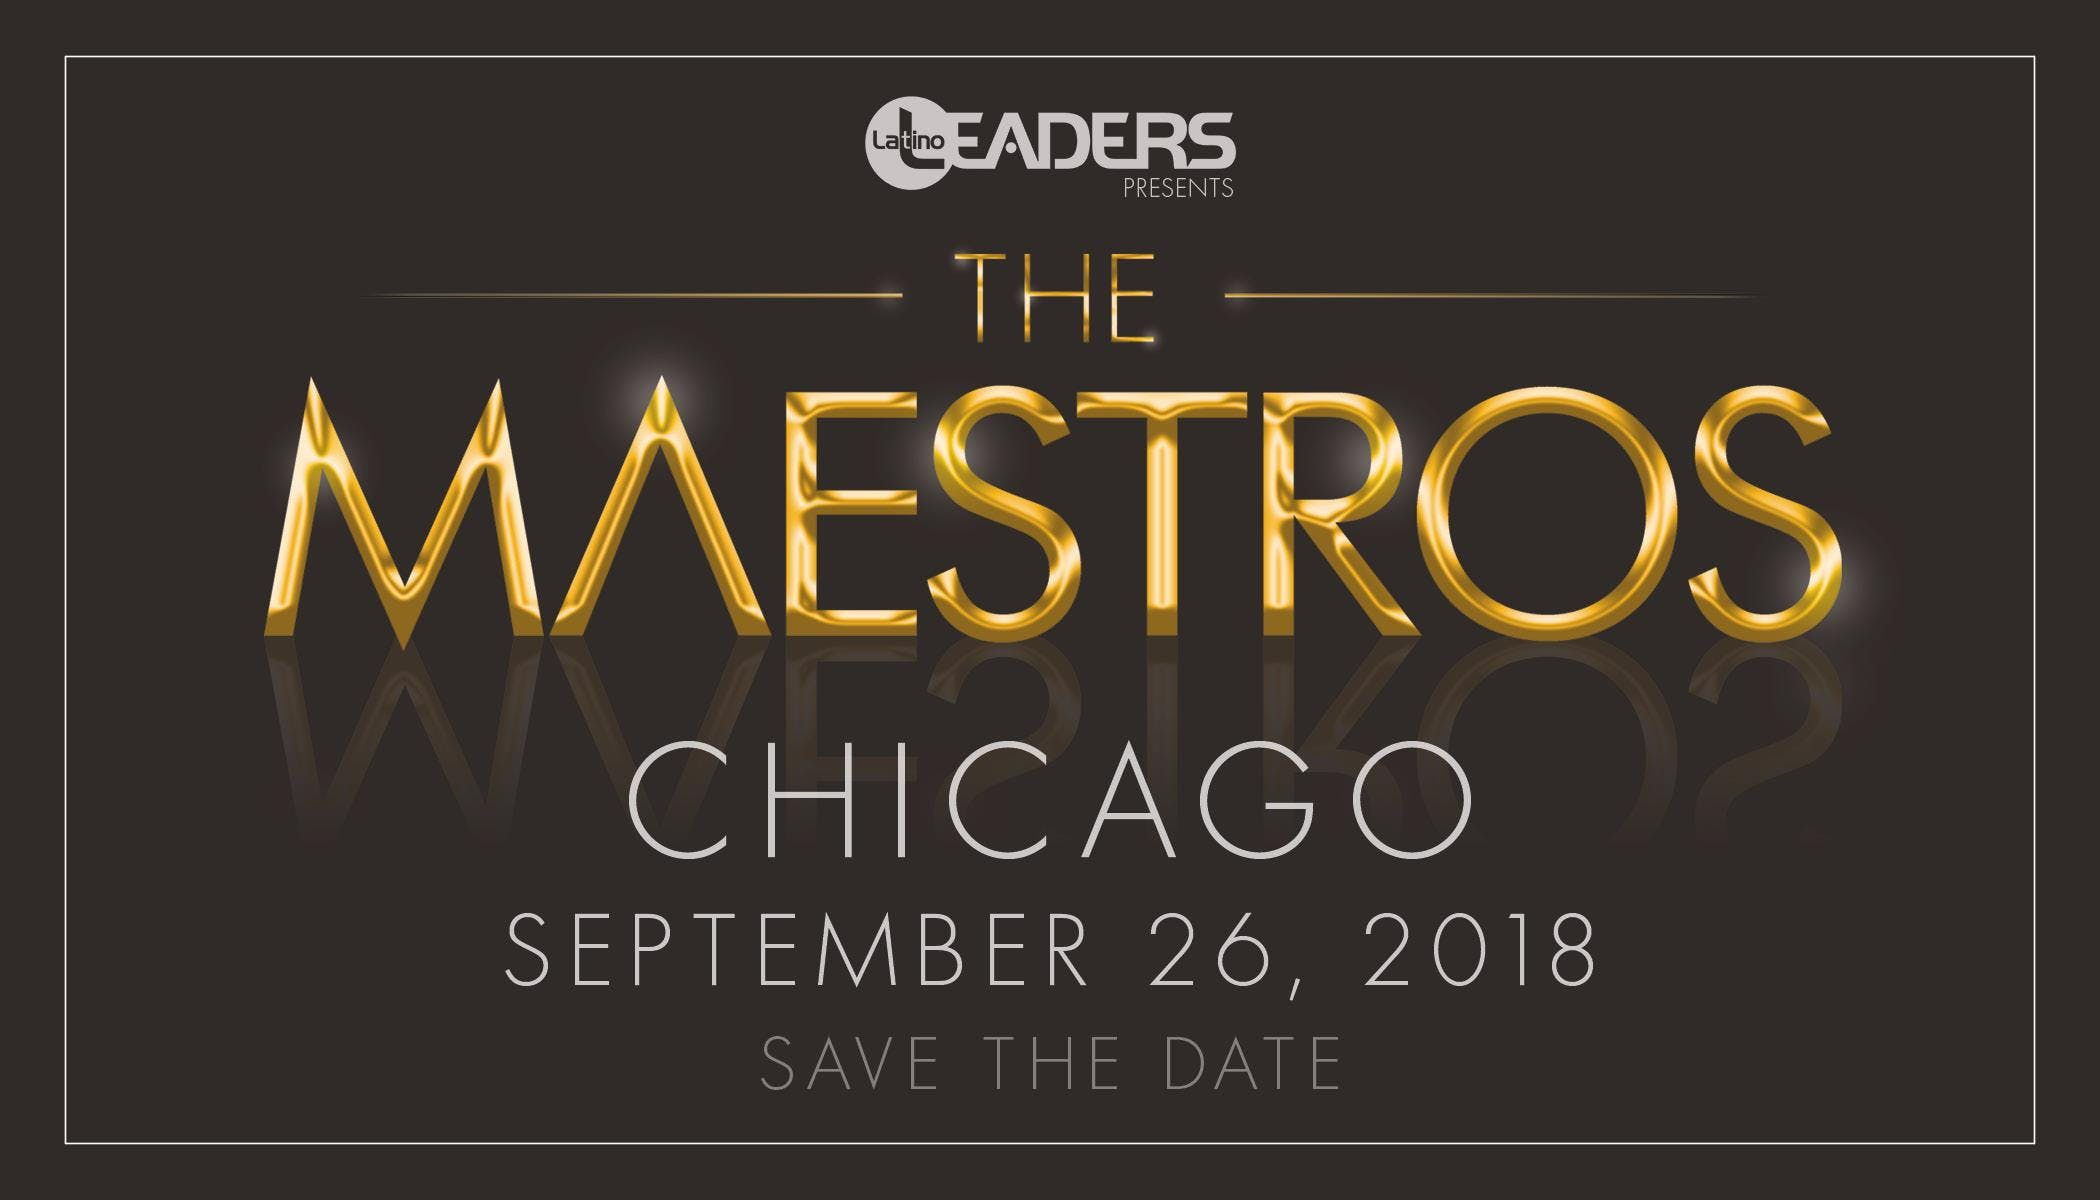 The Maestros: Chicago 2018